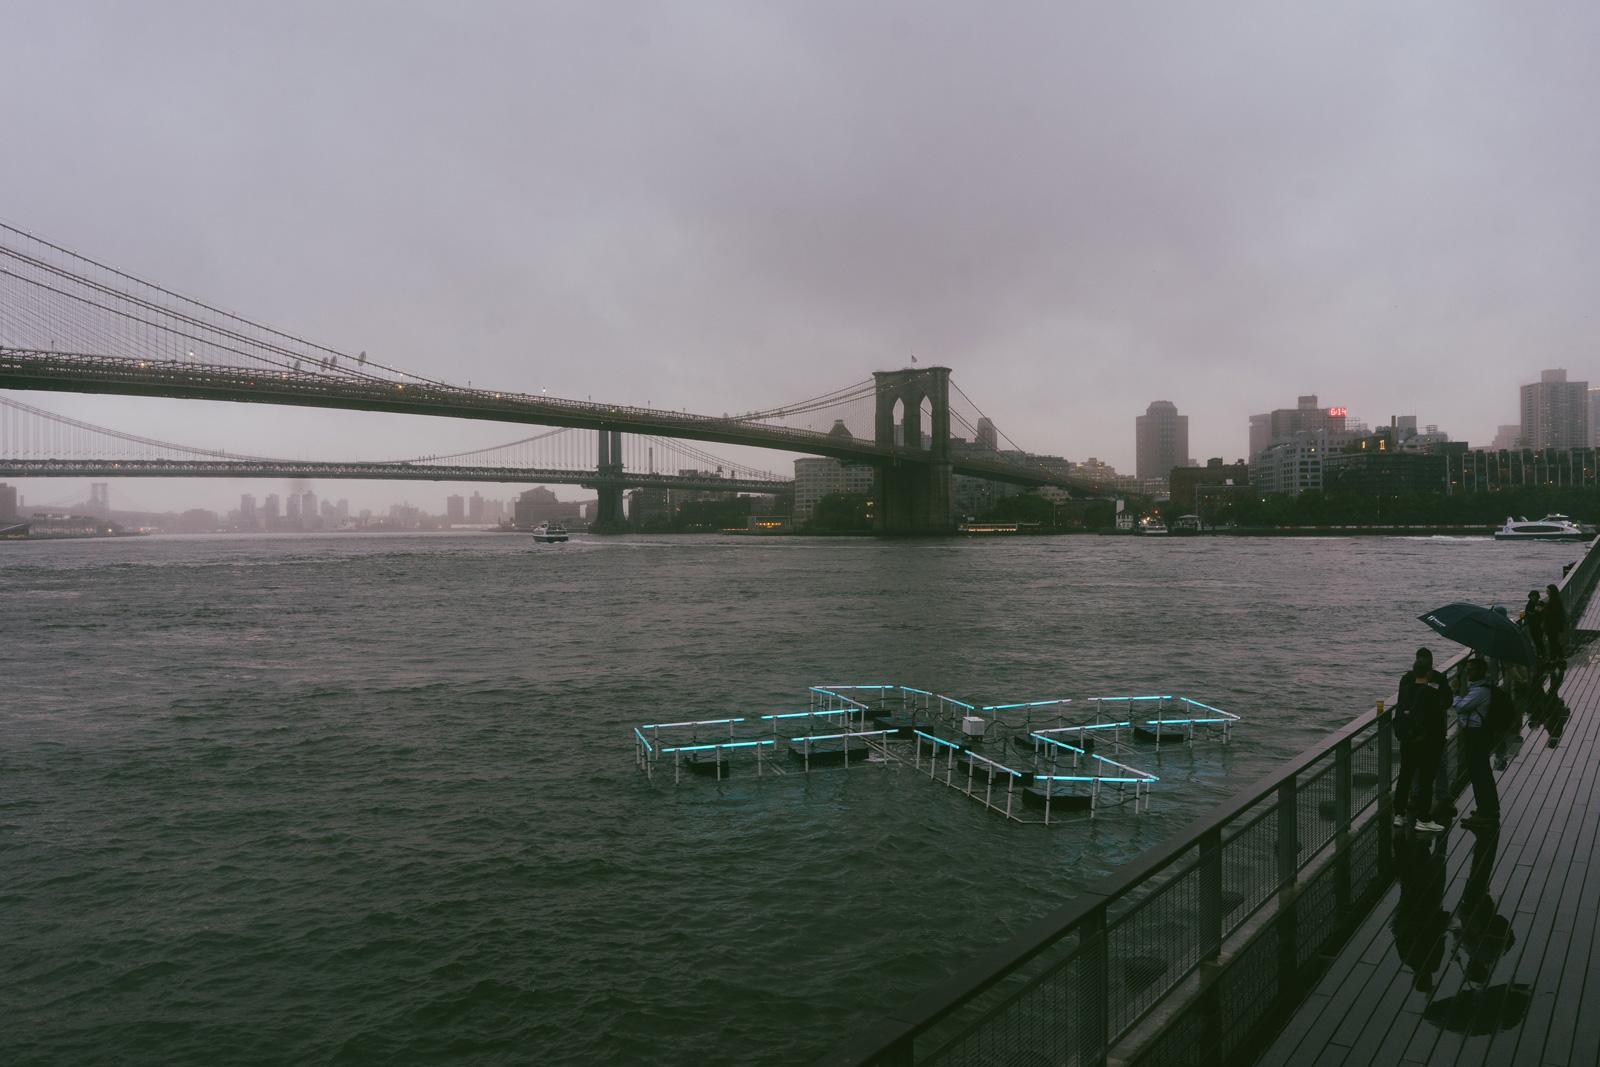 Floating LED sculpture on Manhattan's East River,